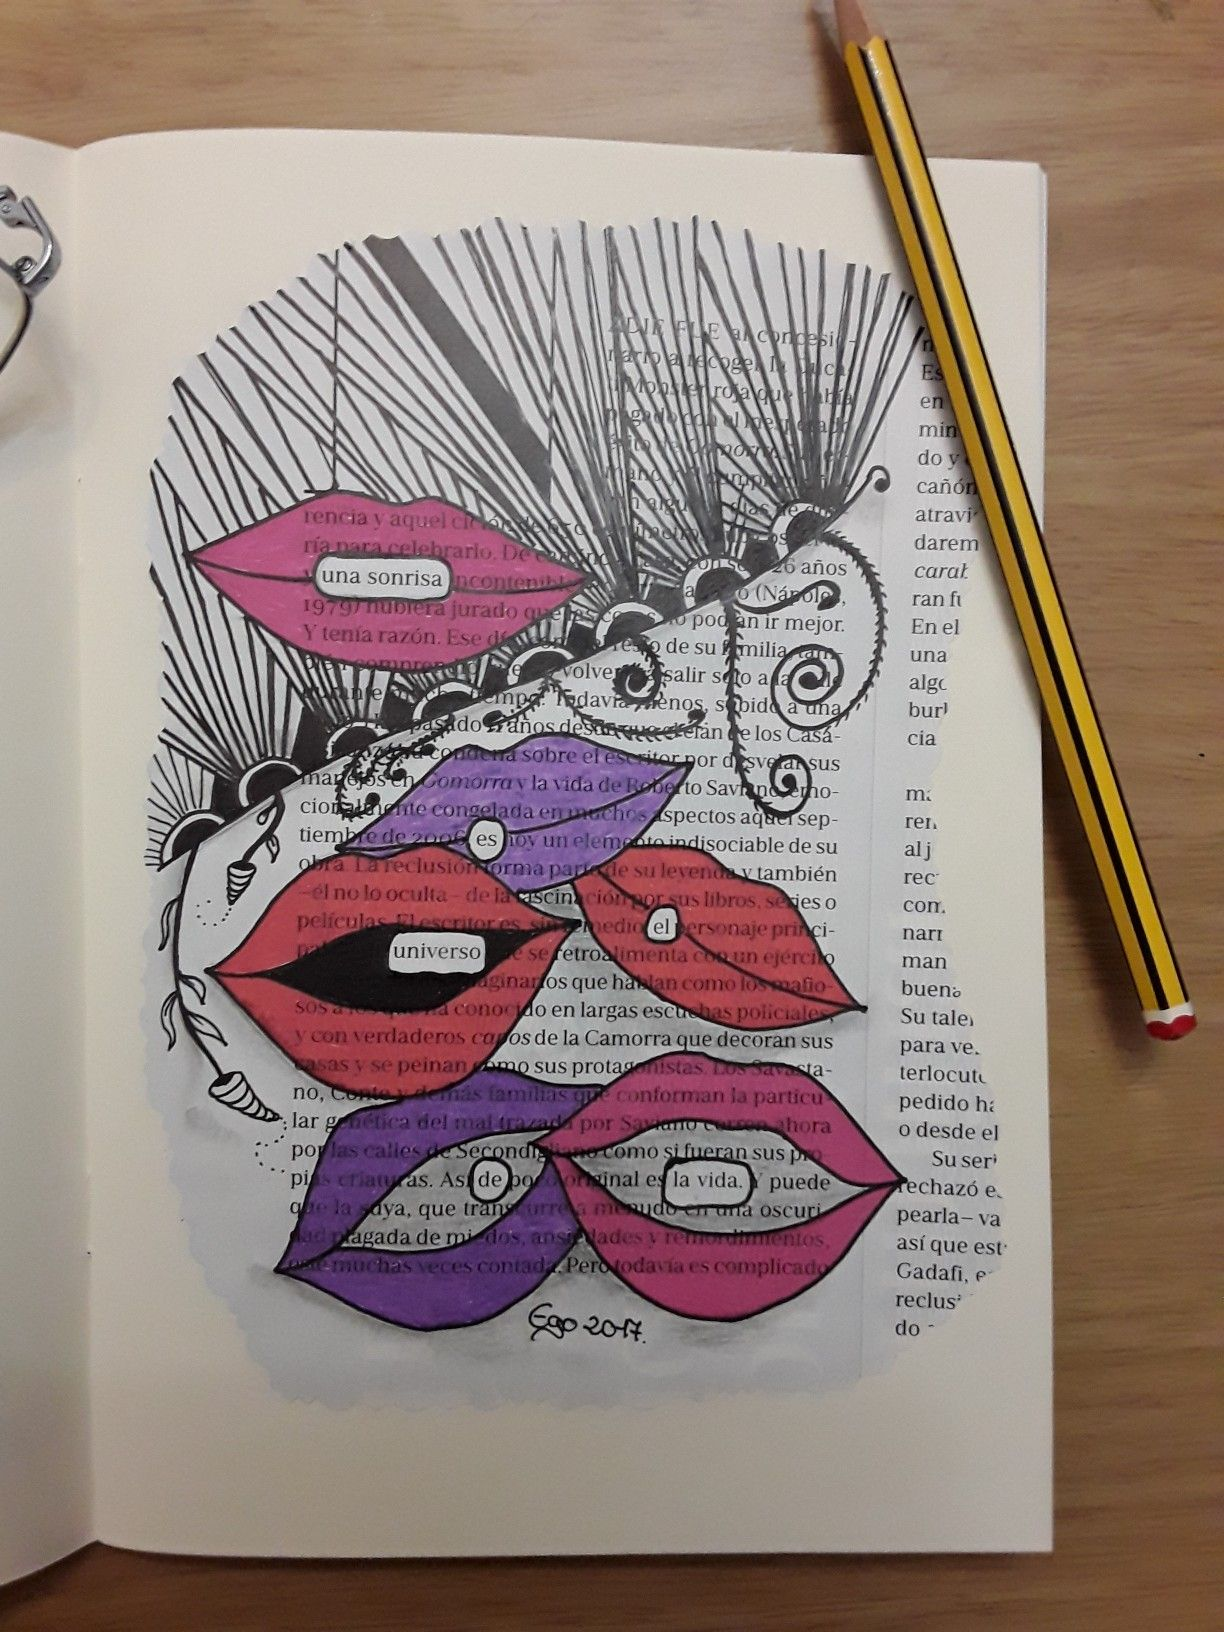 Pin By Angeles Vergara On Papel Tangle Zentangle Zen Enredos Dibujos Book Art Sketchbook Journaling Art Journal